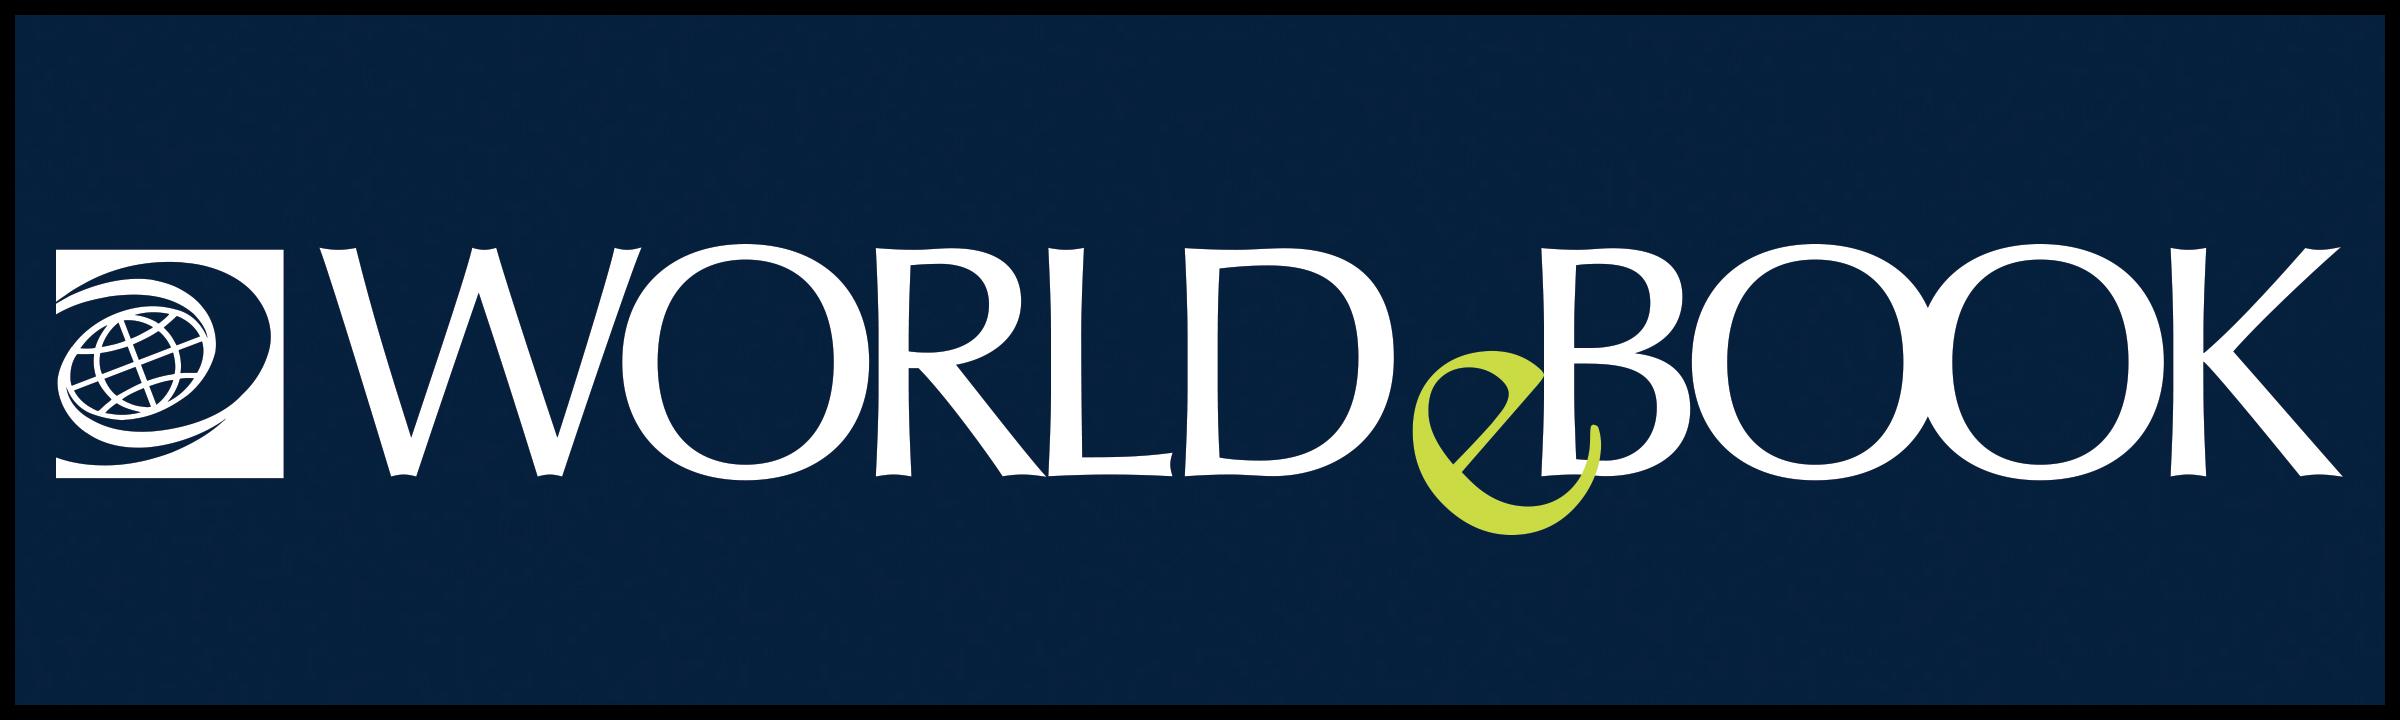 Image result for world book ebooks